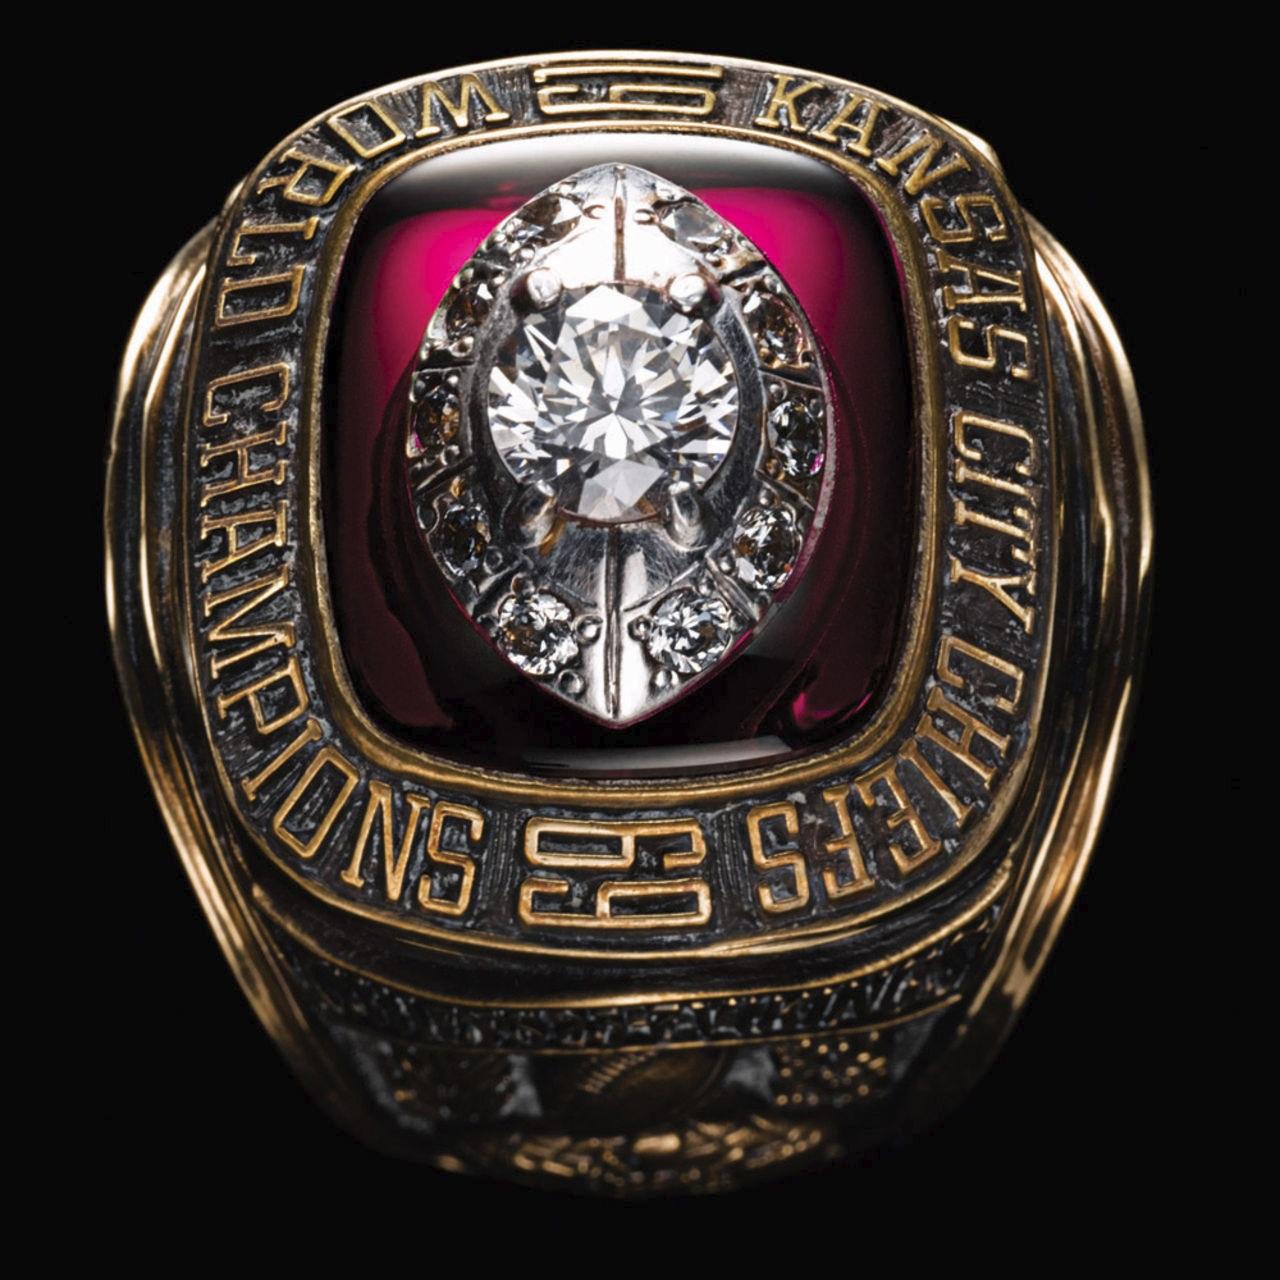 Kansas City Chiefs 1970 champions ring